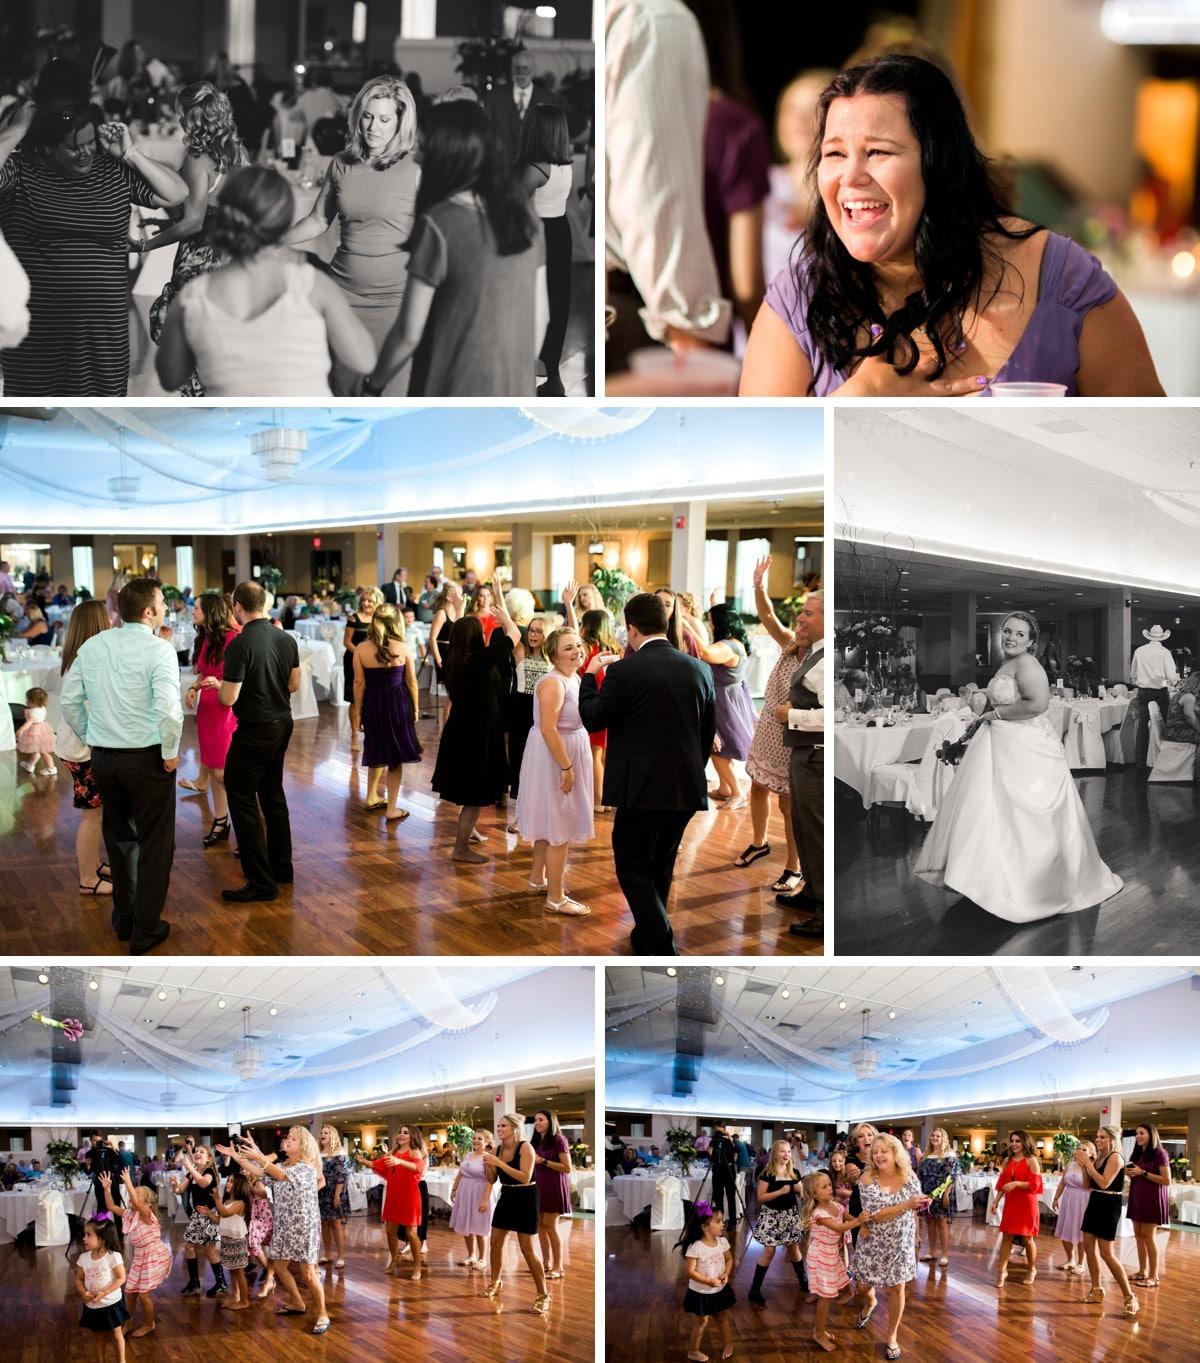 St. Louis Moolah Ballroom Wedding, STL Wedding Photographer